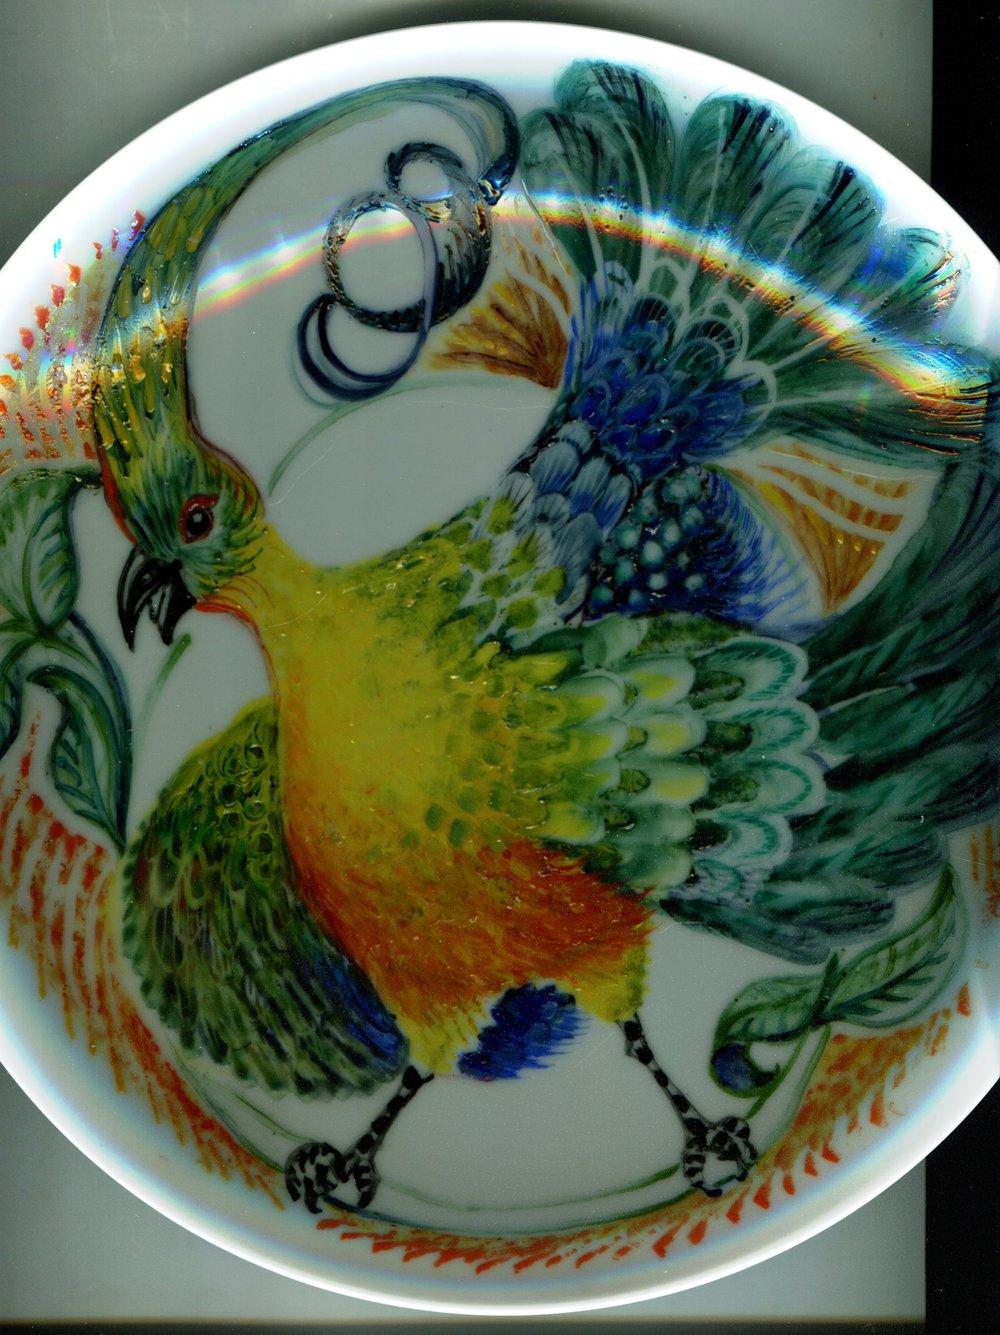 41a Kathy Pienaar, Decorative Plate, Onglaze enamel ceramic